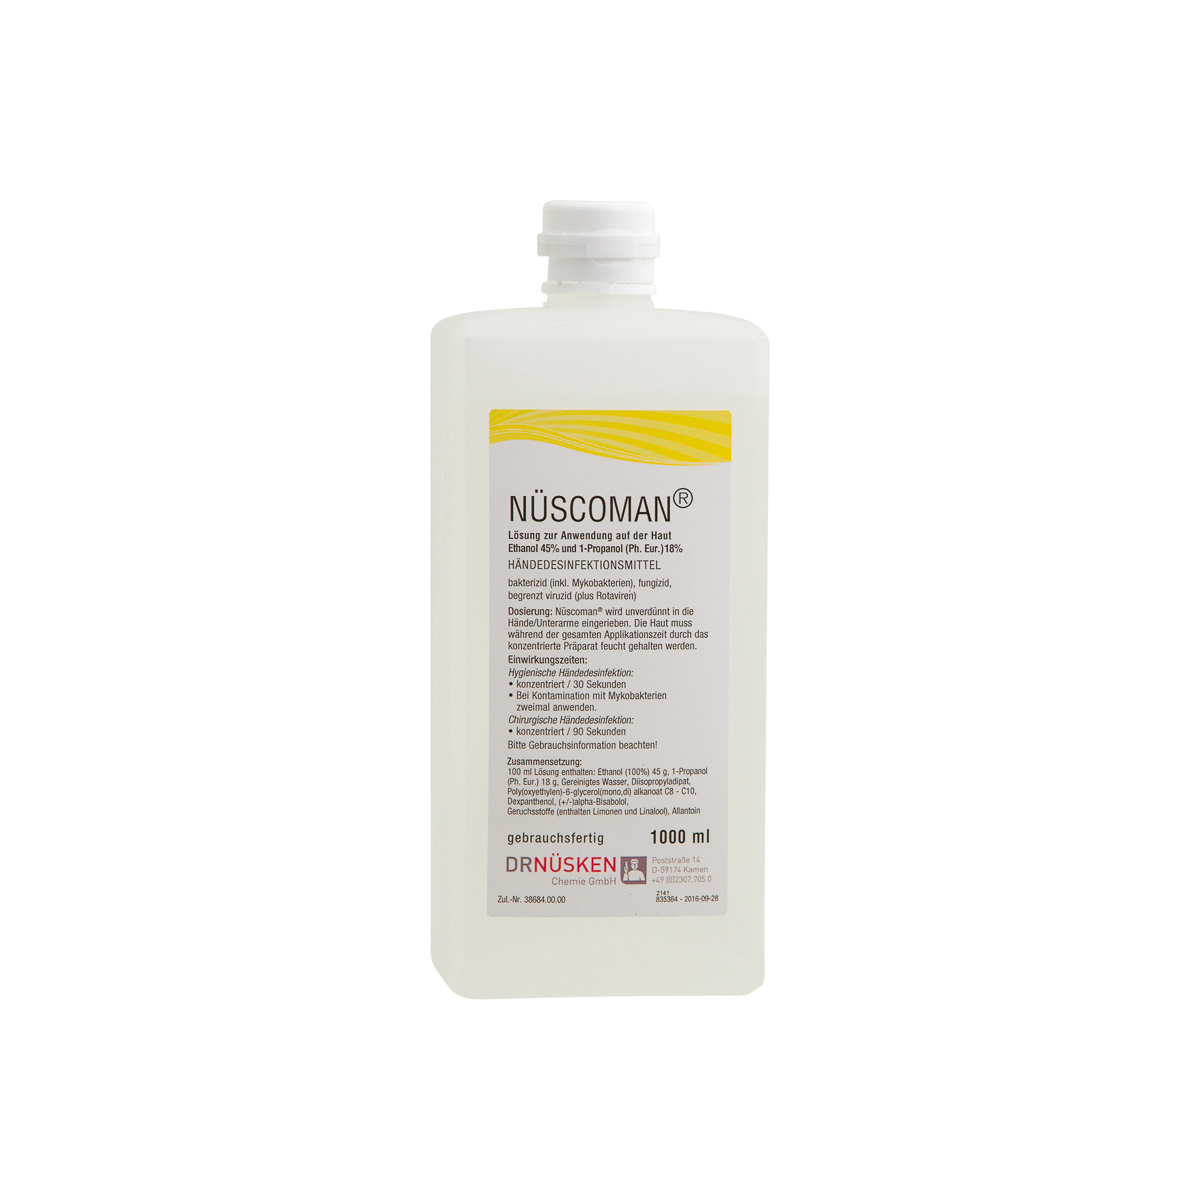 Nüscoman® 1 Liter Händedesinfektionsmittel